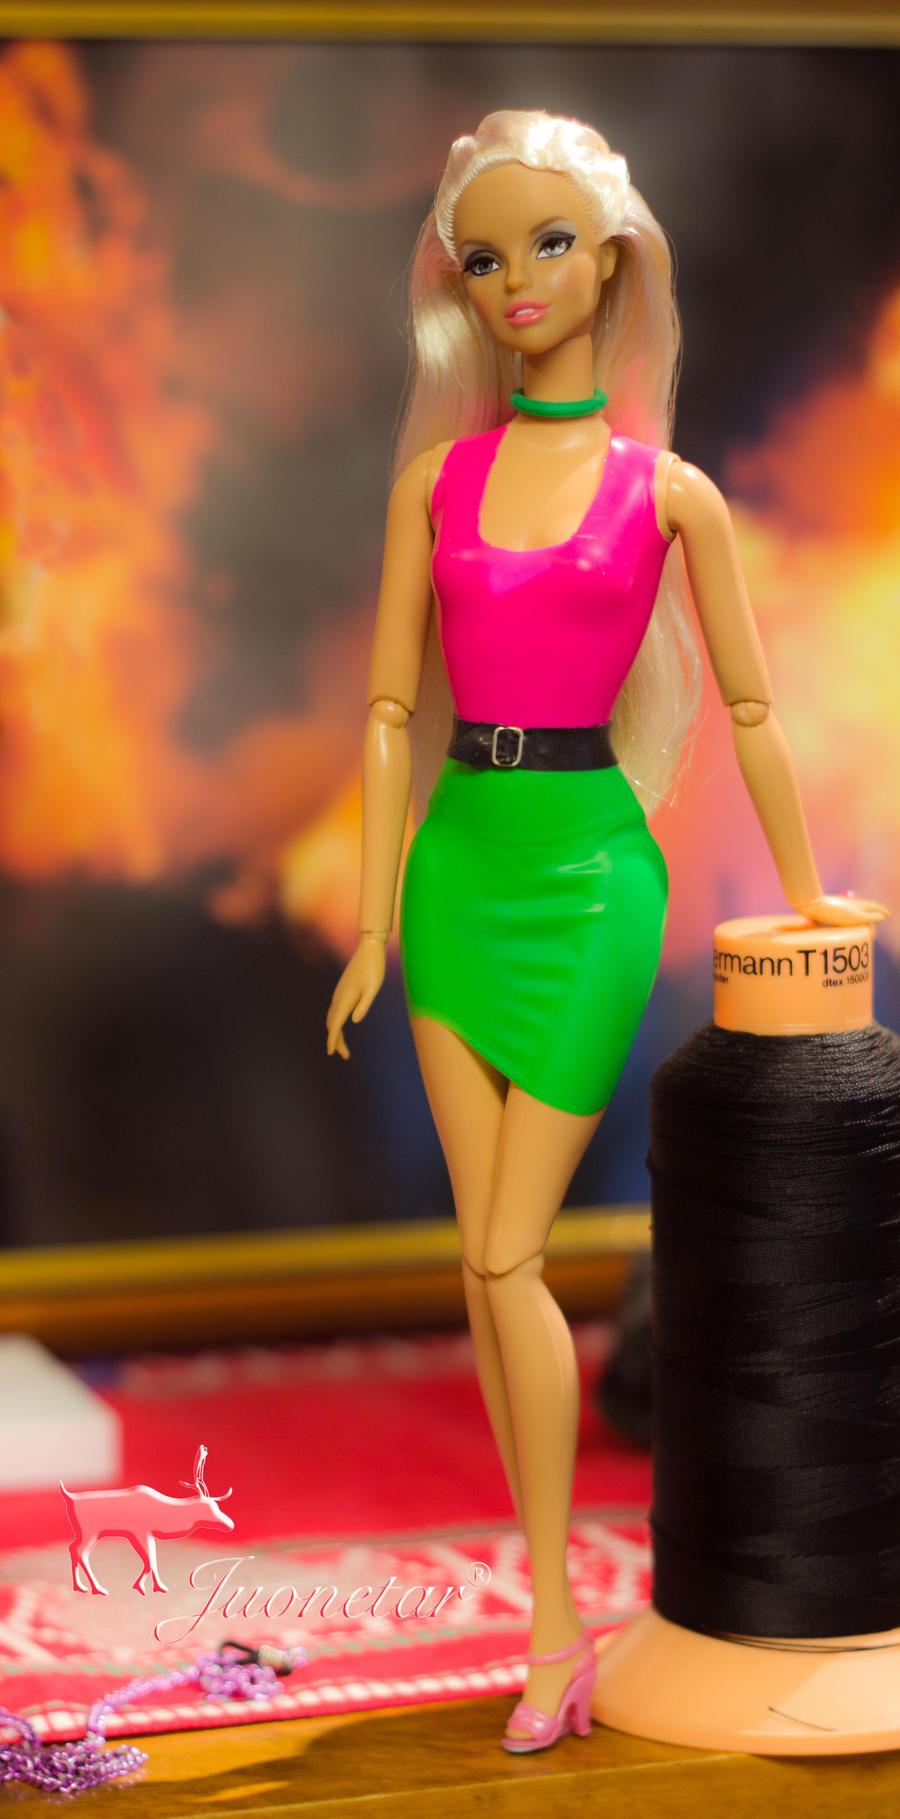 1990s in fashion - Wikipedia Permainan barbie a fashion